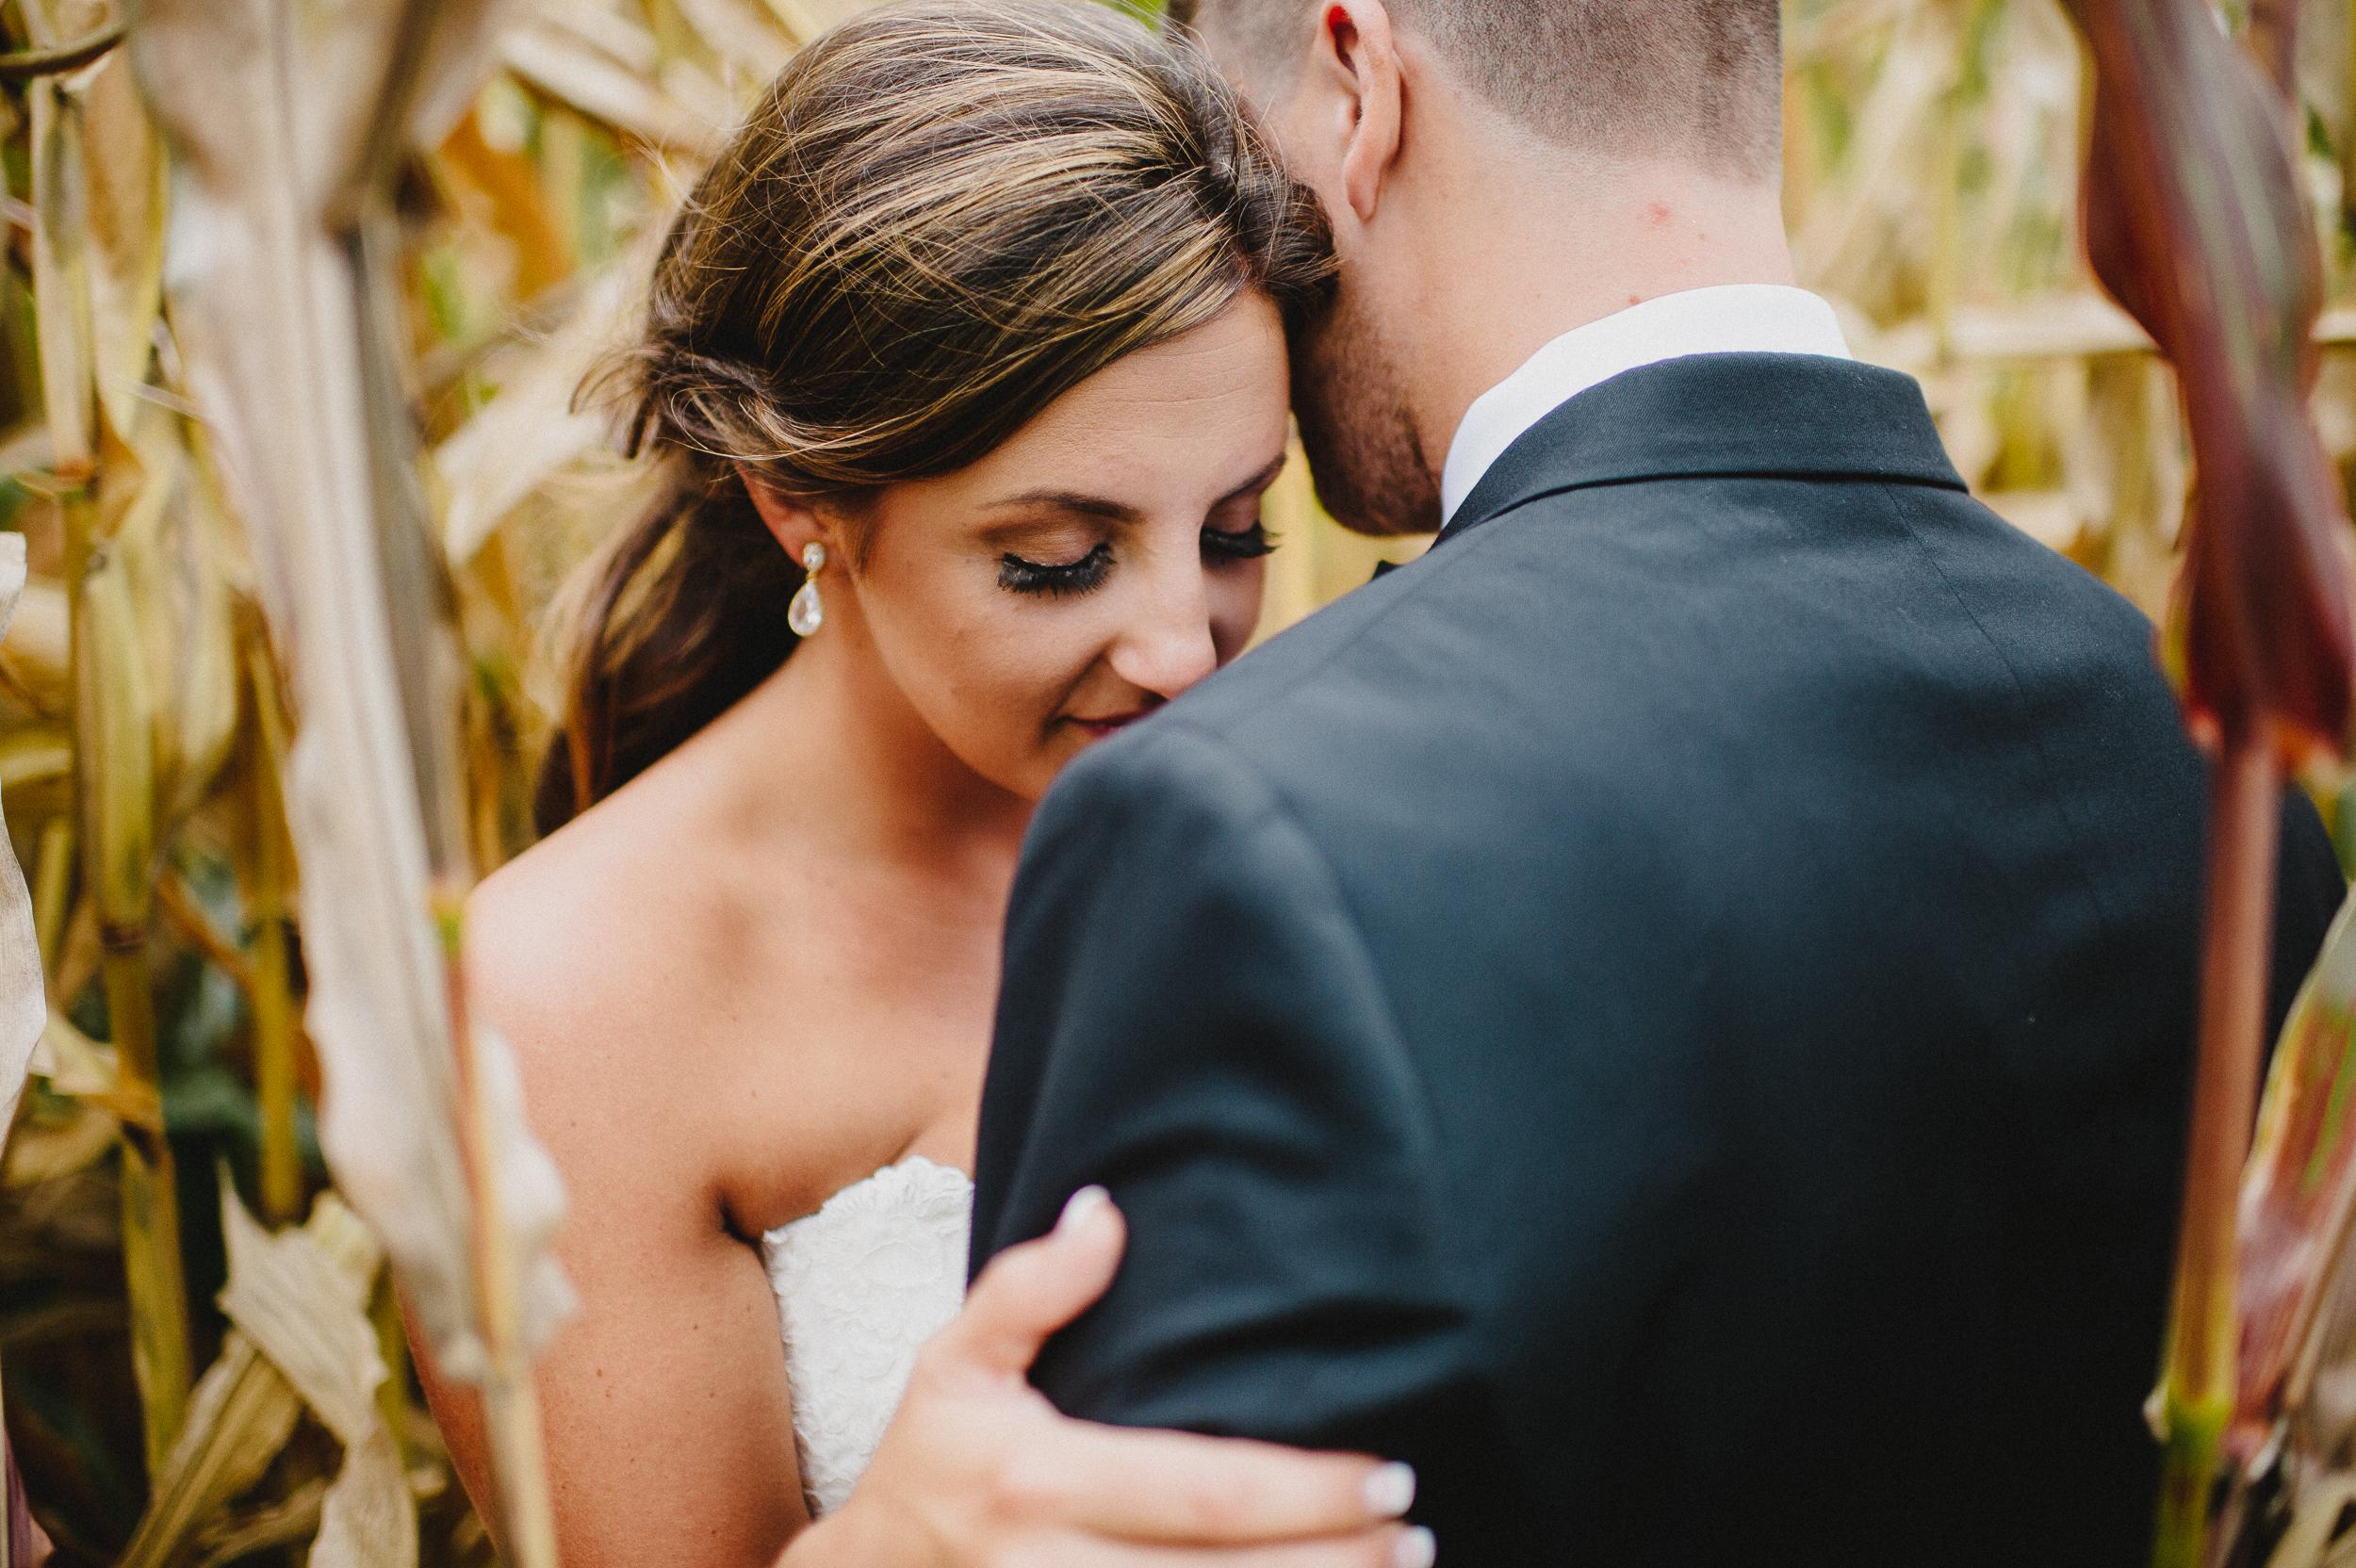 delaware-estate-wedding-photographer-pat-robinson-photography-61.jpg